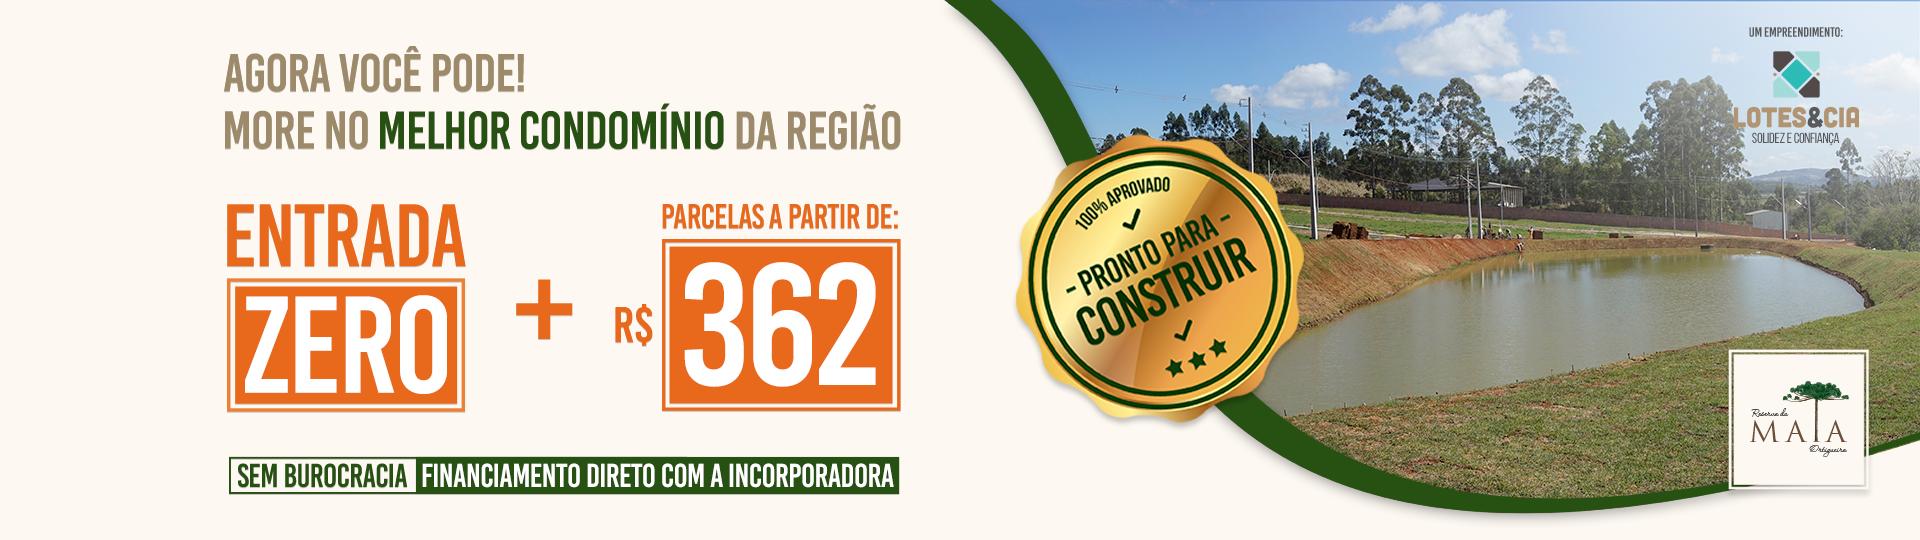 Lotes condomínios fechados em Ortigueira - Reserva da Mata